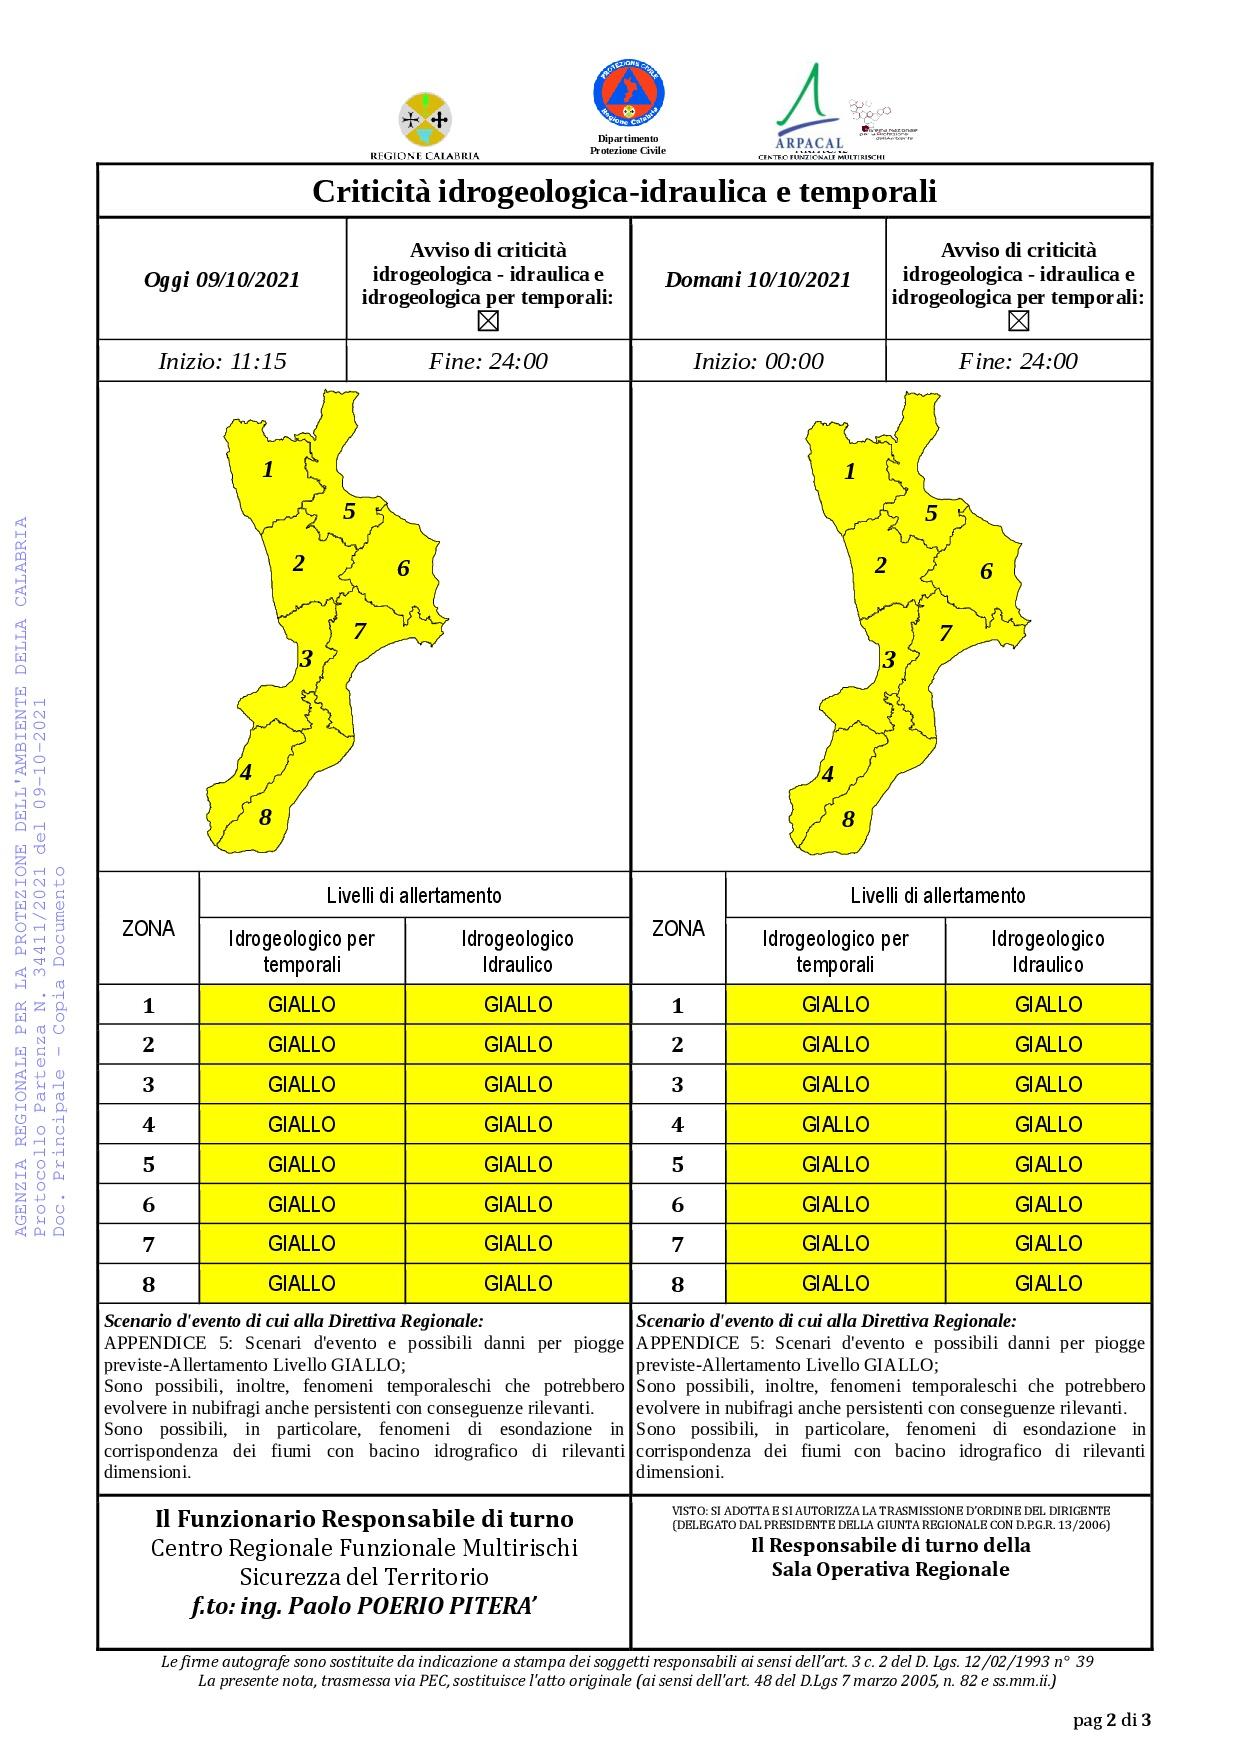 Criticità idrogeologica-idraulica e temporali in Calabria 09-10-2021